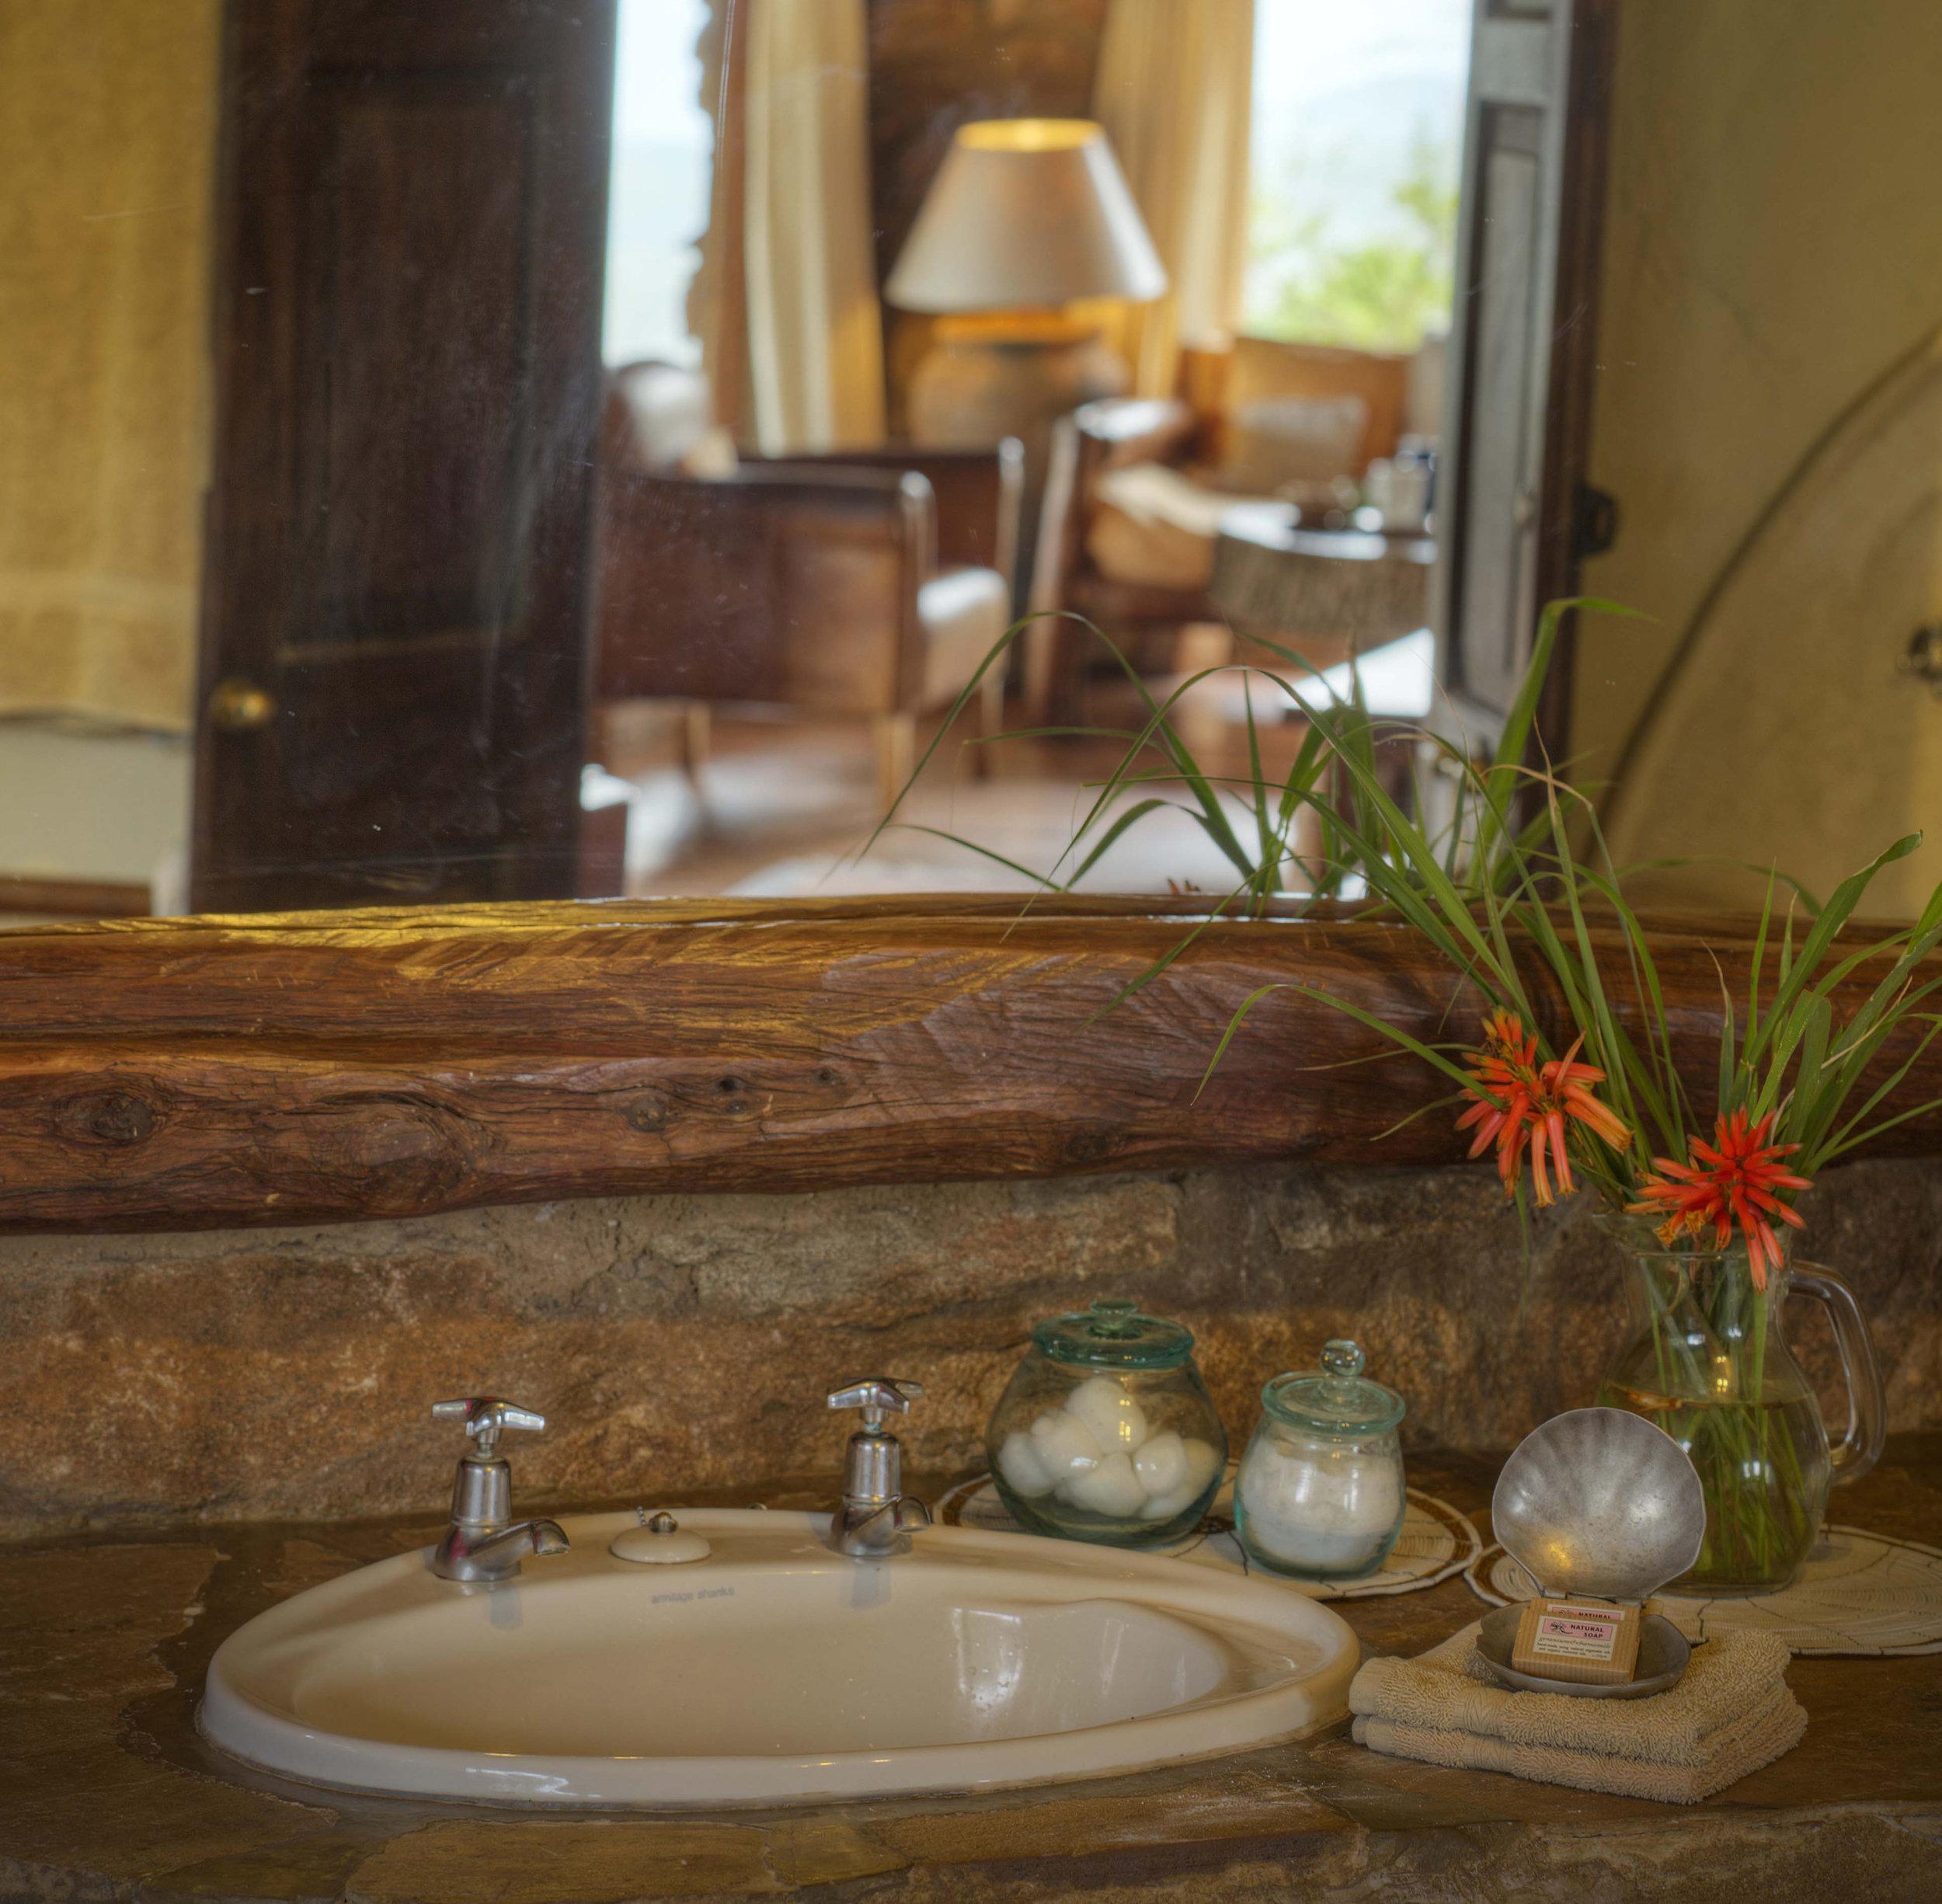 Borana 2018 Room 1 bathroom 2.jpg